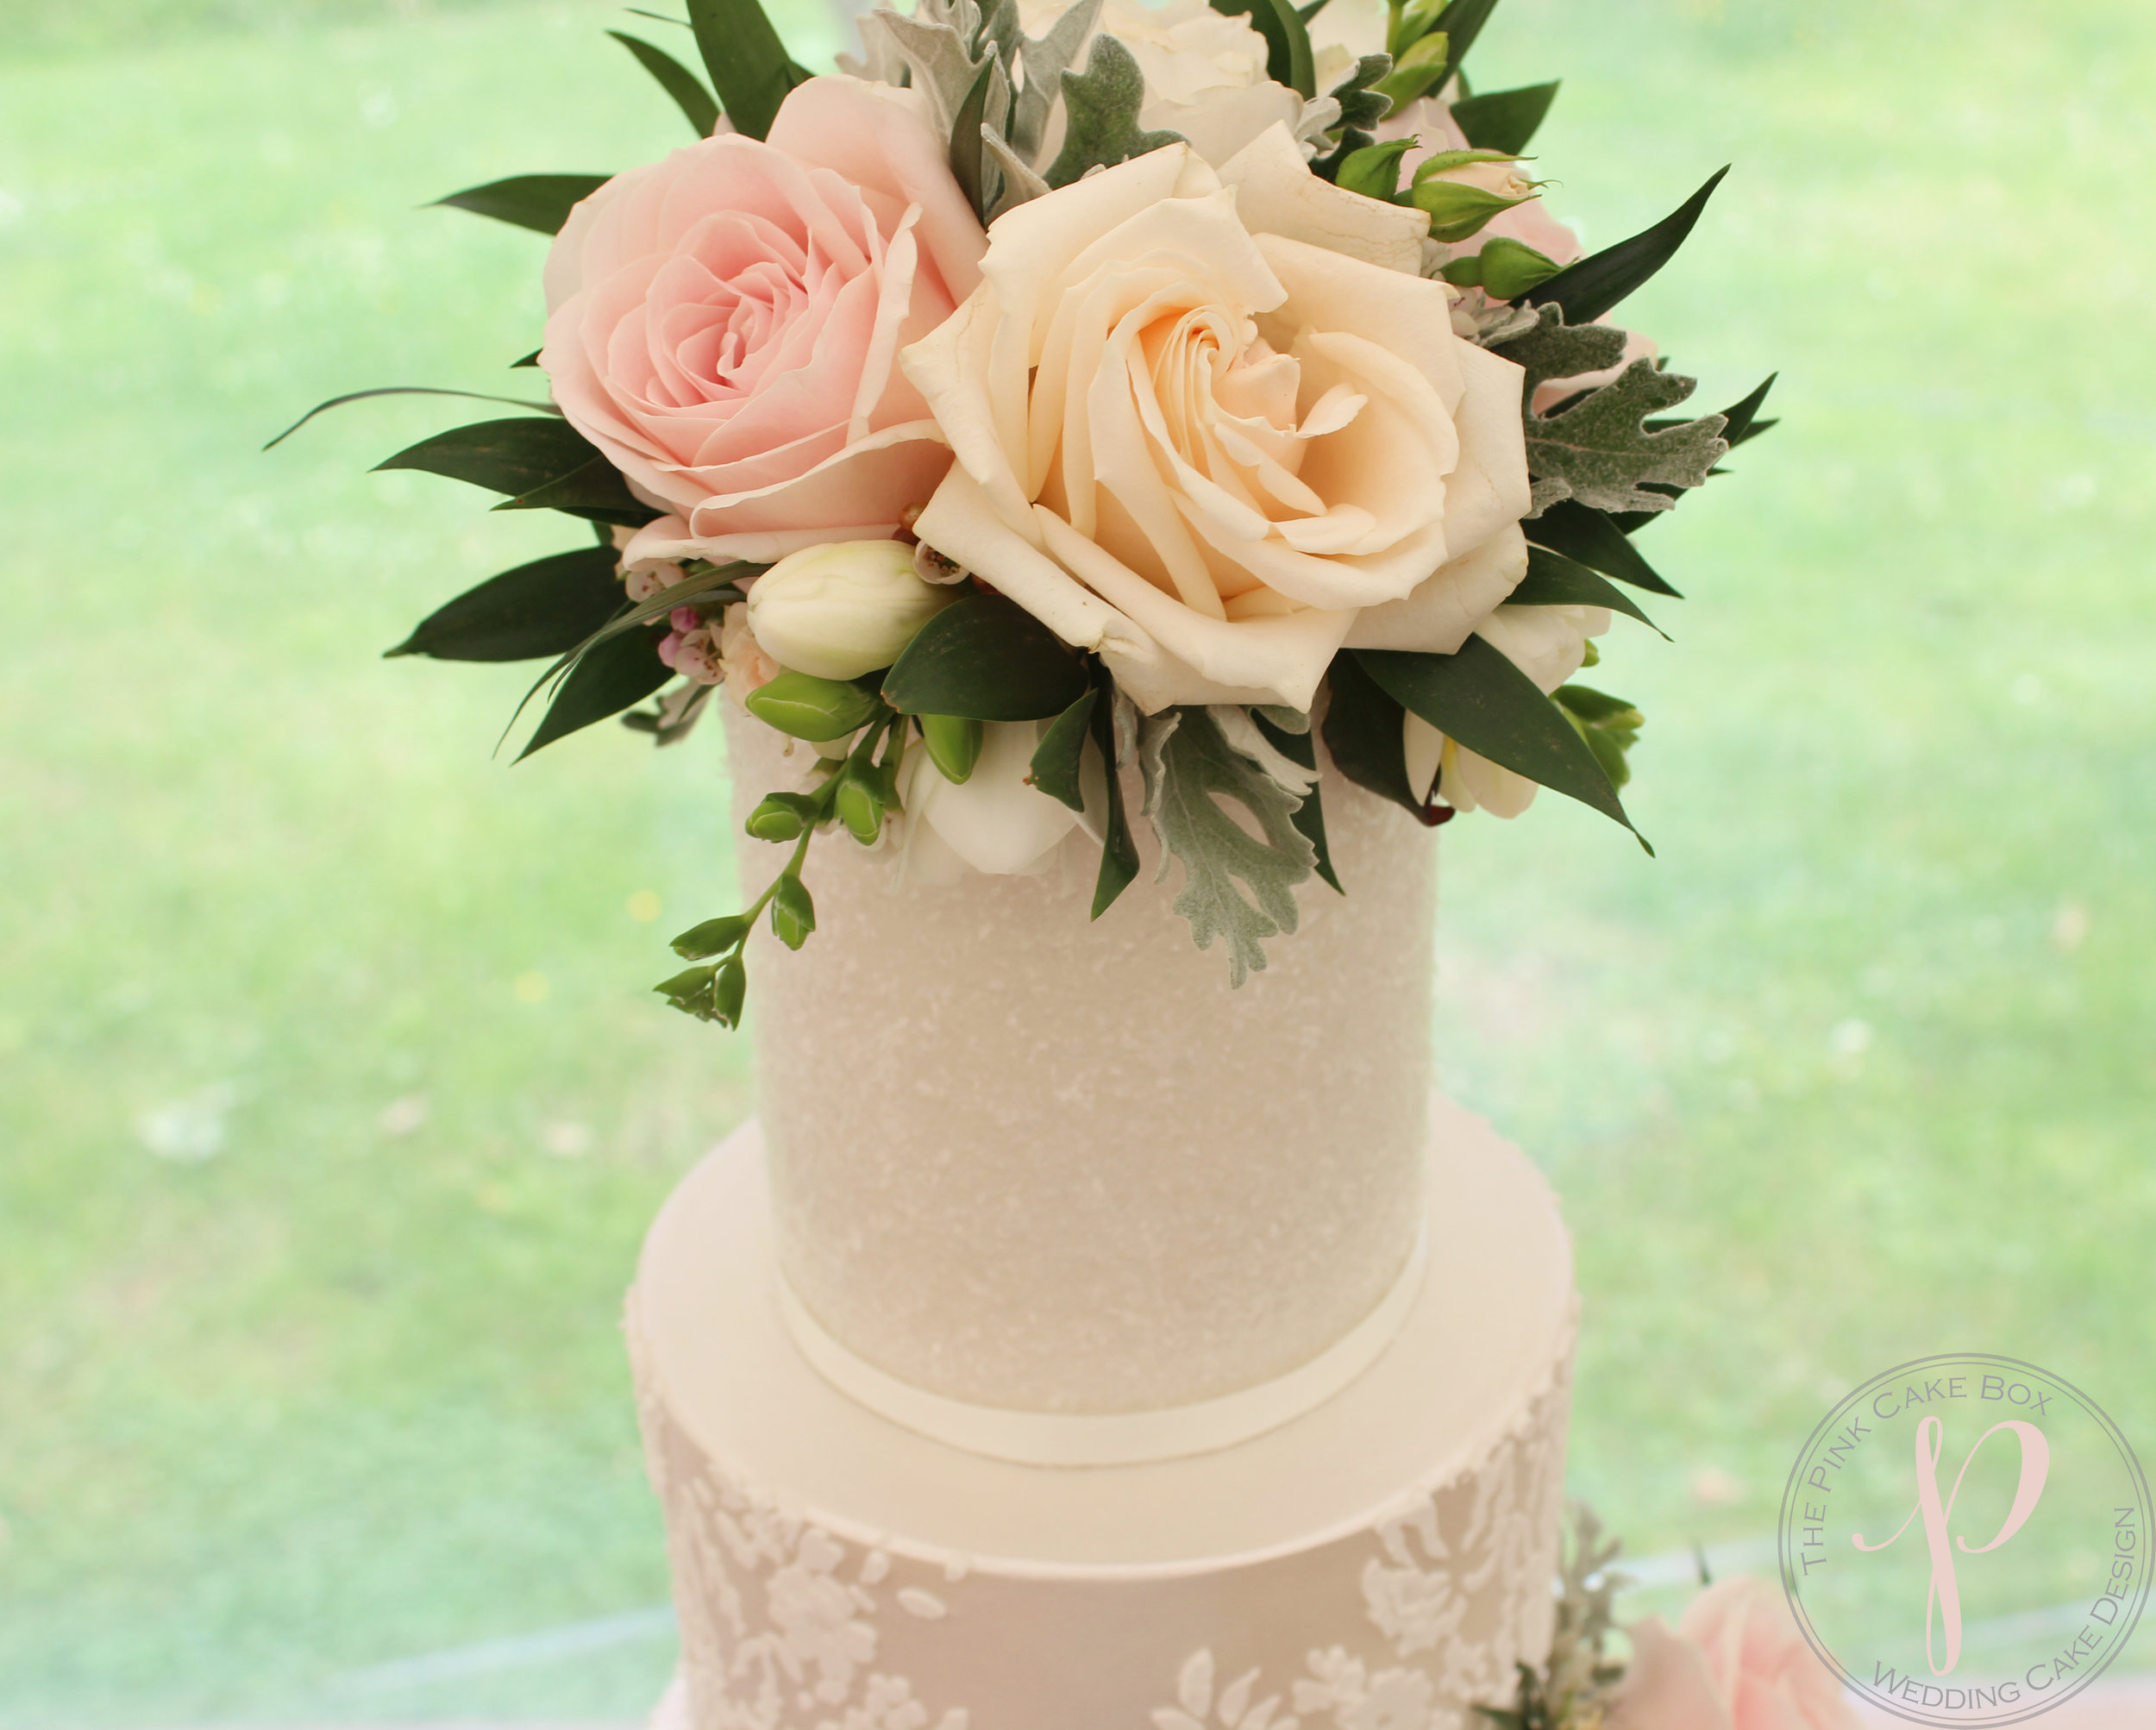 beautifu sparkle wedding cake with fresh flowers.jpg